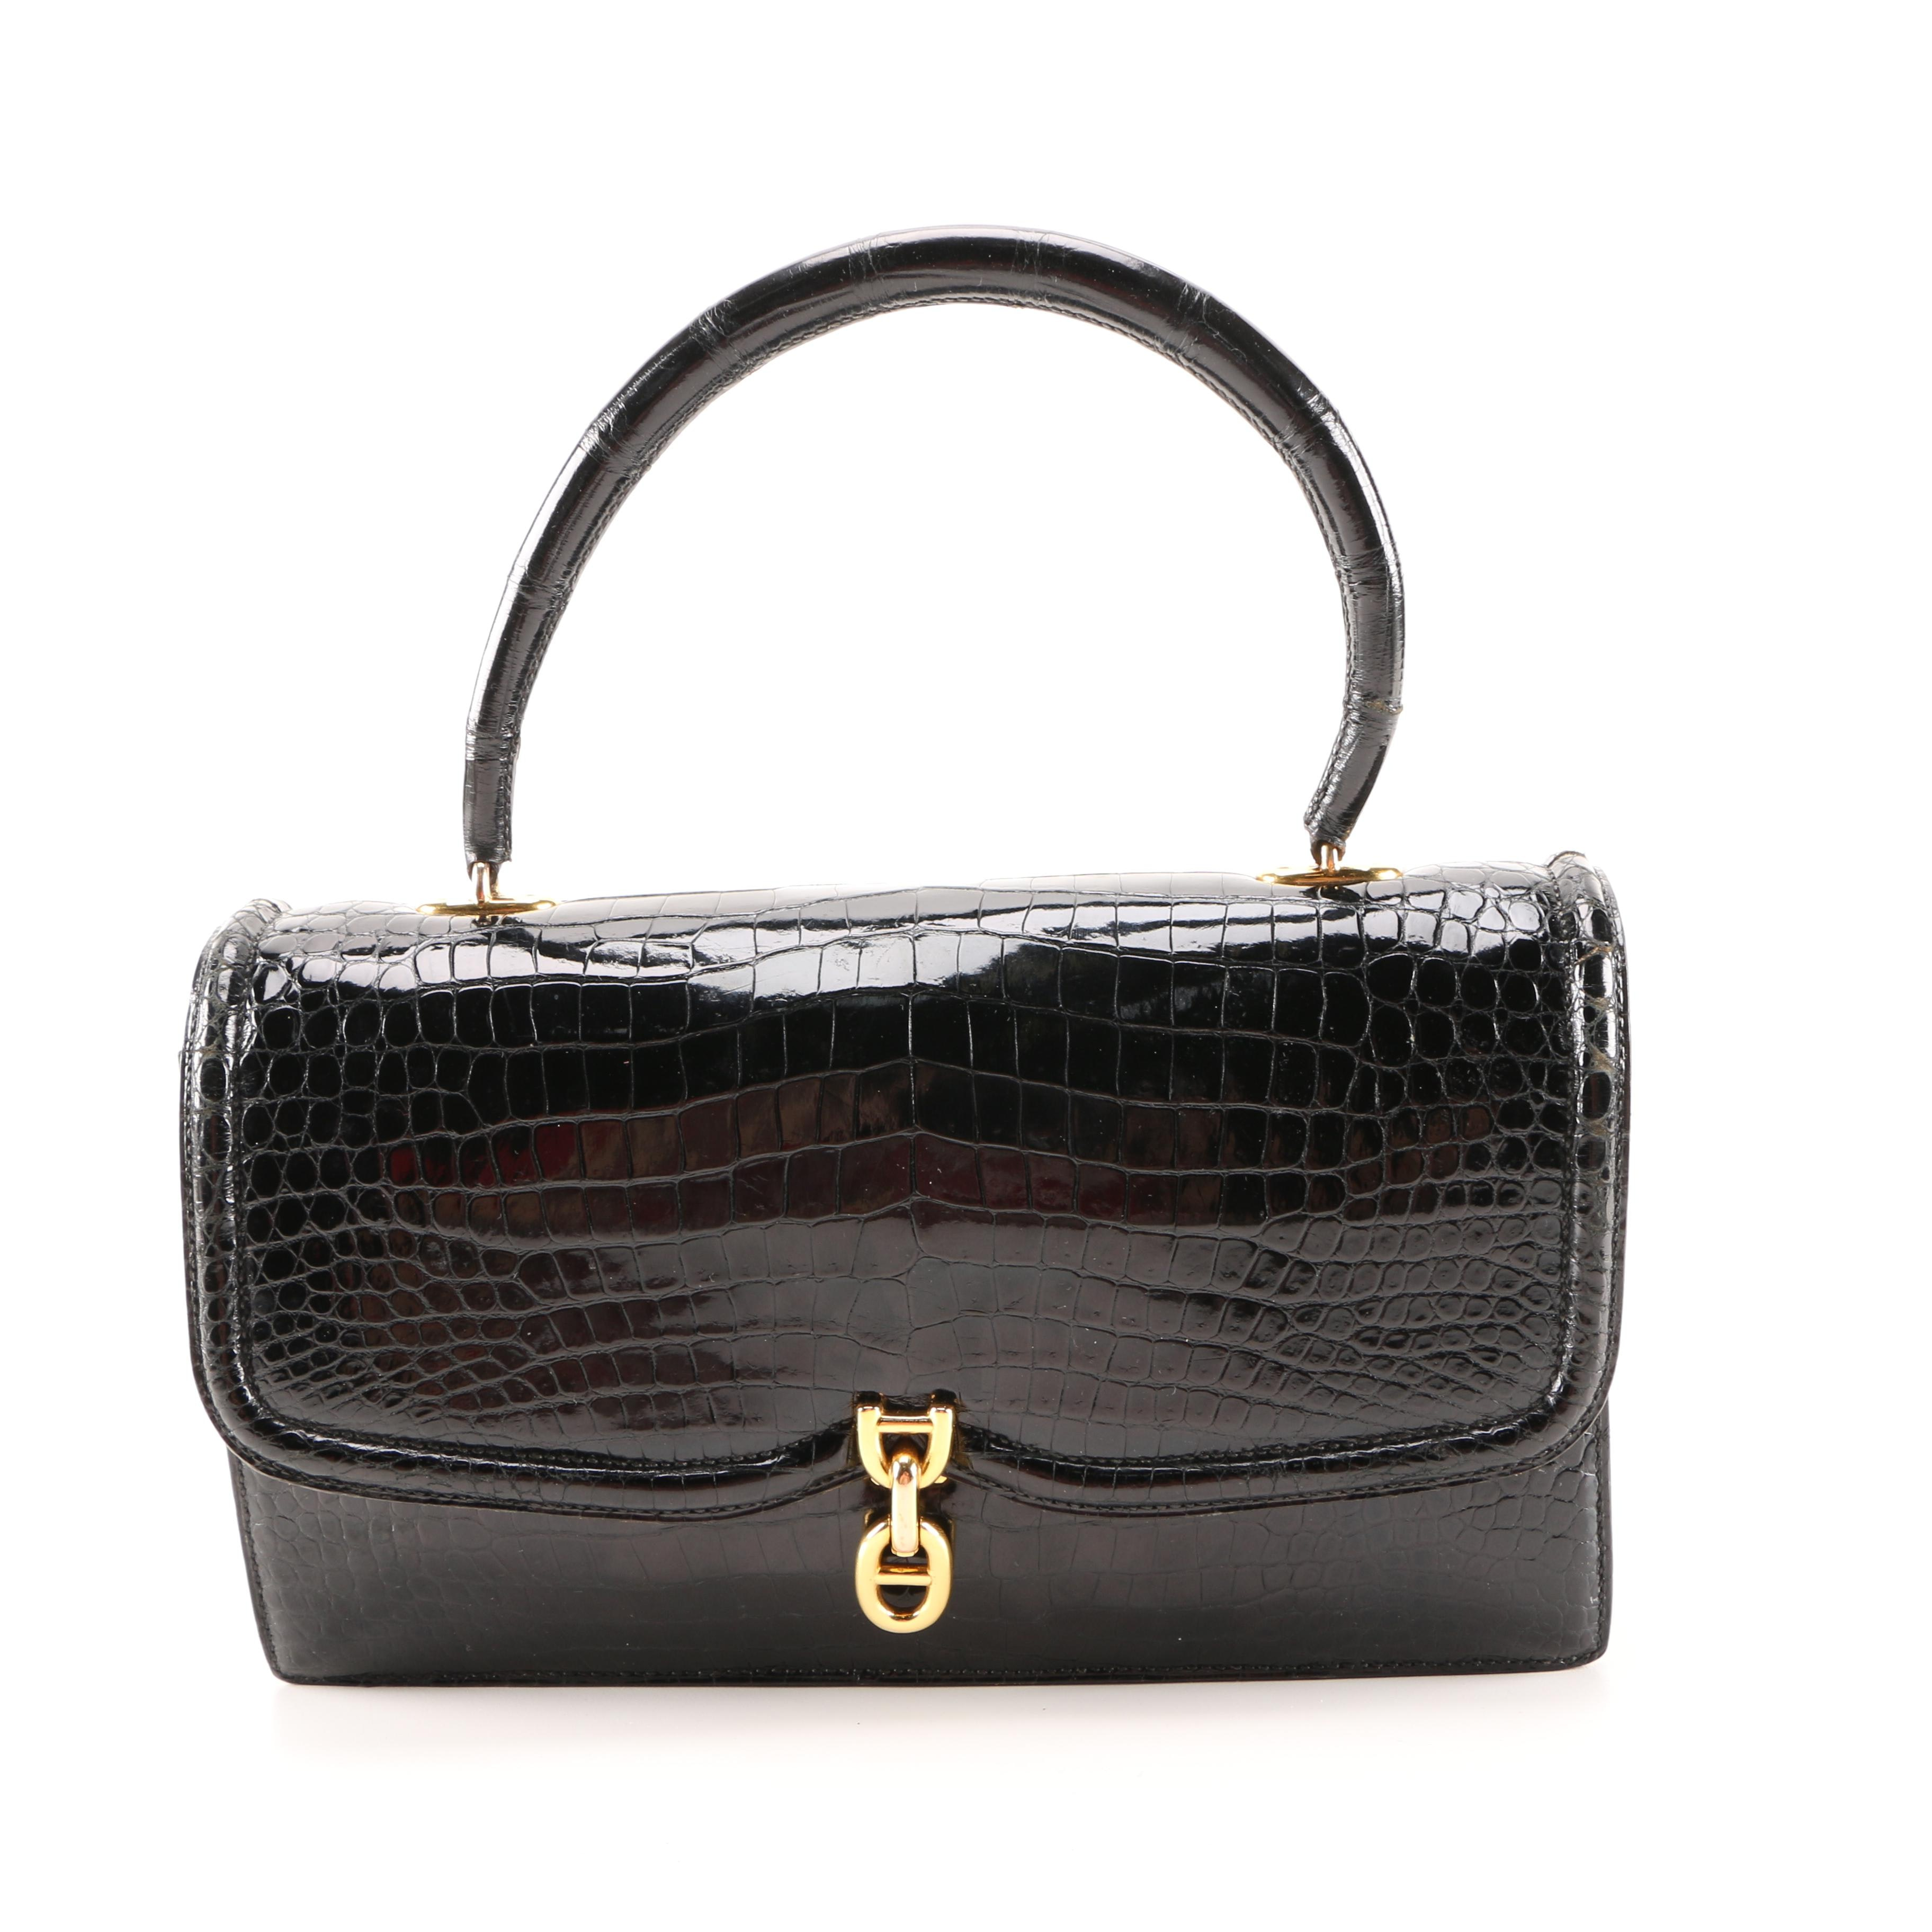 Vintage Hermès Alligator Chaine d'Ancre Handbag